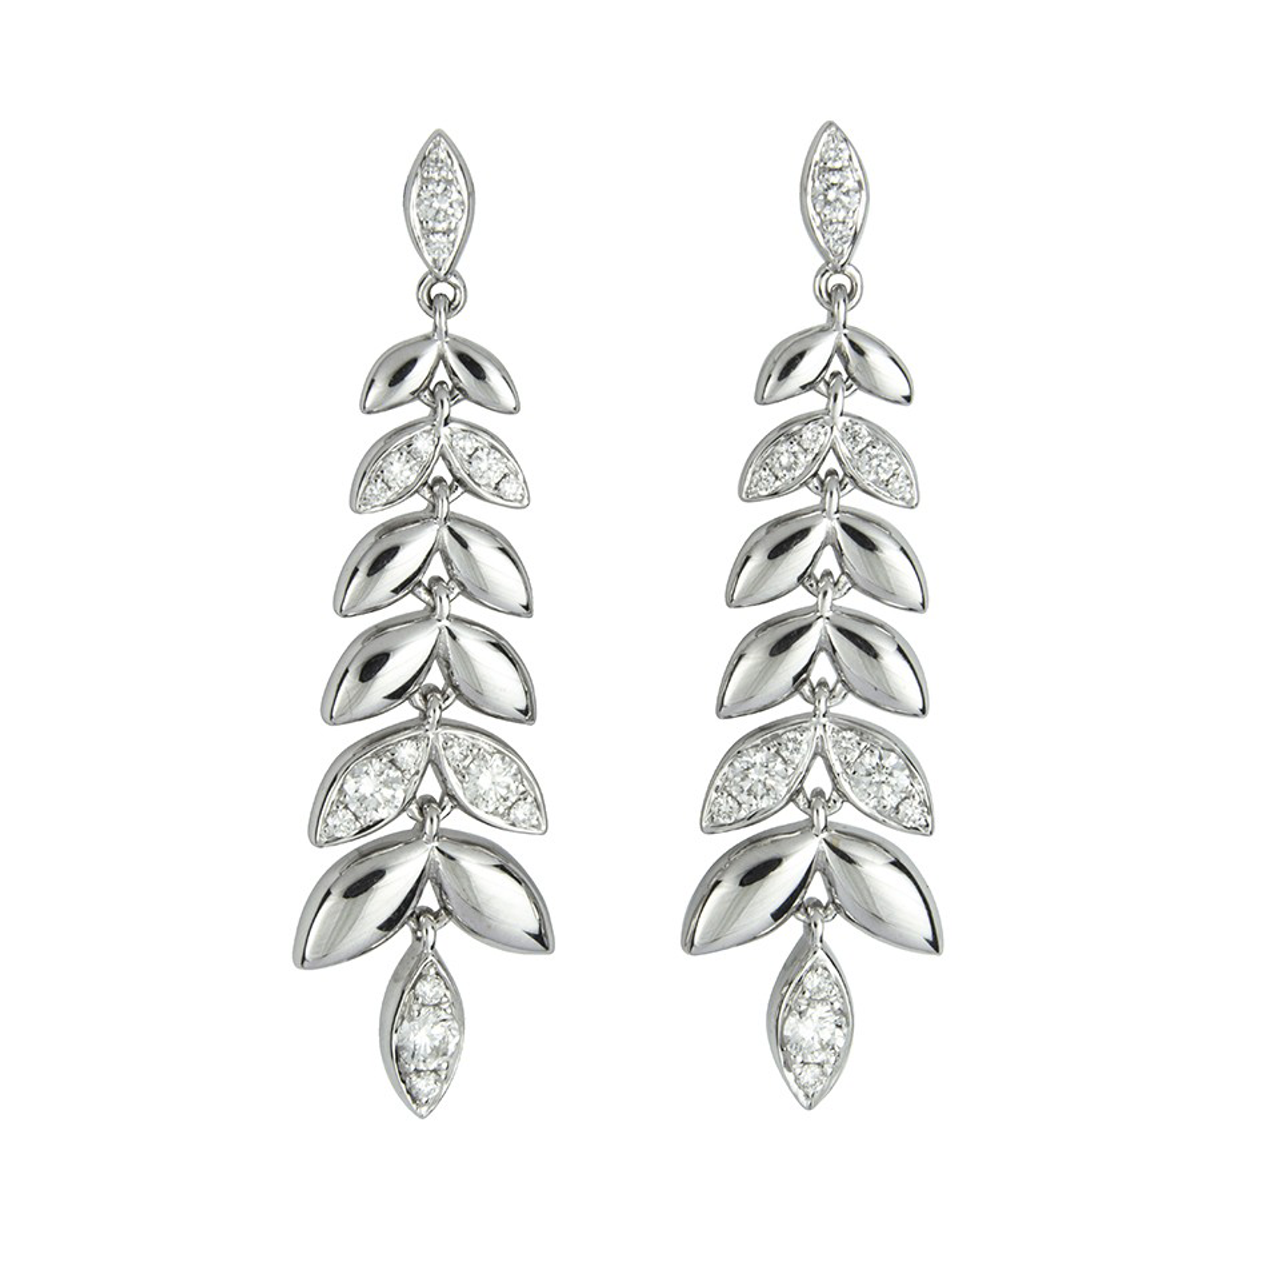 db545b797 18ct White Gold Diamond Barleycorn Drop Earrings